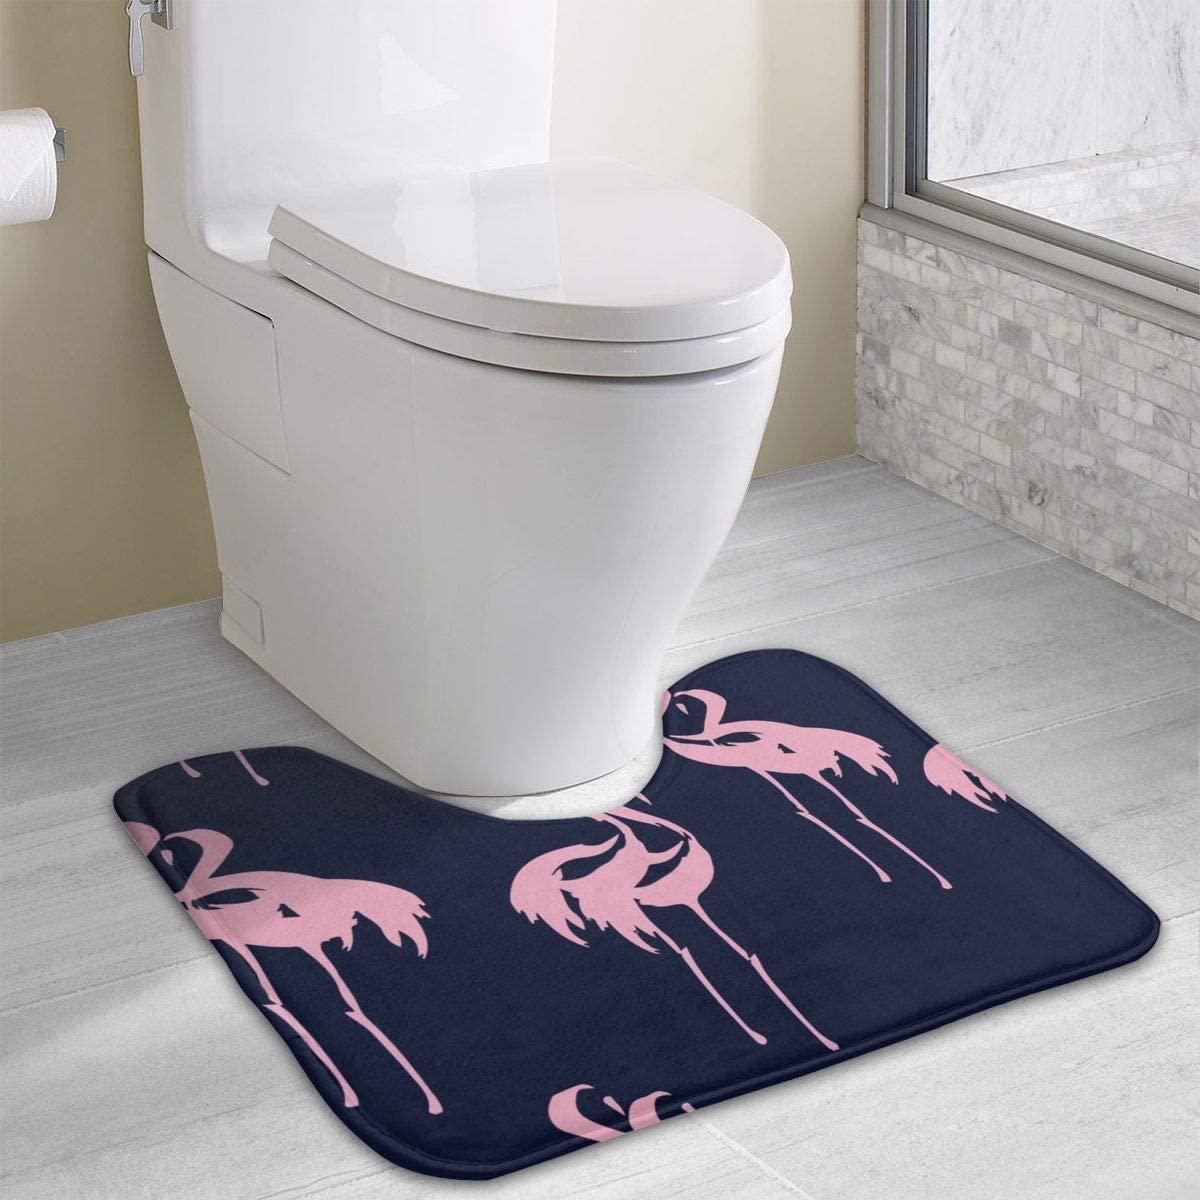 NiYoung Anti-Skid Memory Foam Toilet Contour Mat Toilet Bath Rug Pink Flamingos Pattern Home Decor Nursery Rugs Indoor & Outdoor Entrance Mat, Machine-Washable/Quick Dry Doormat